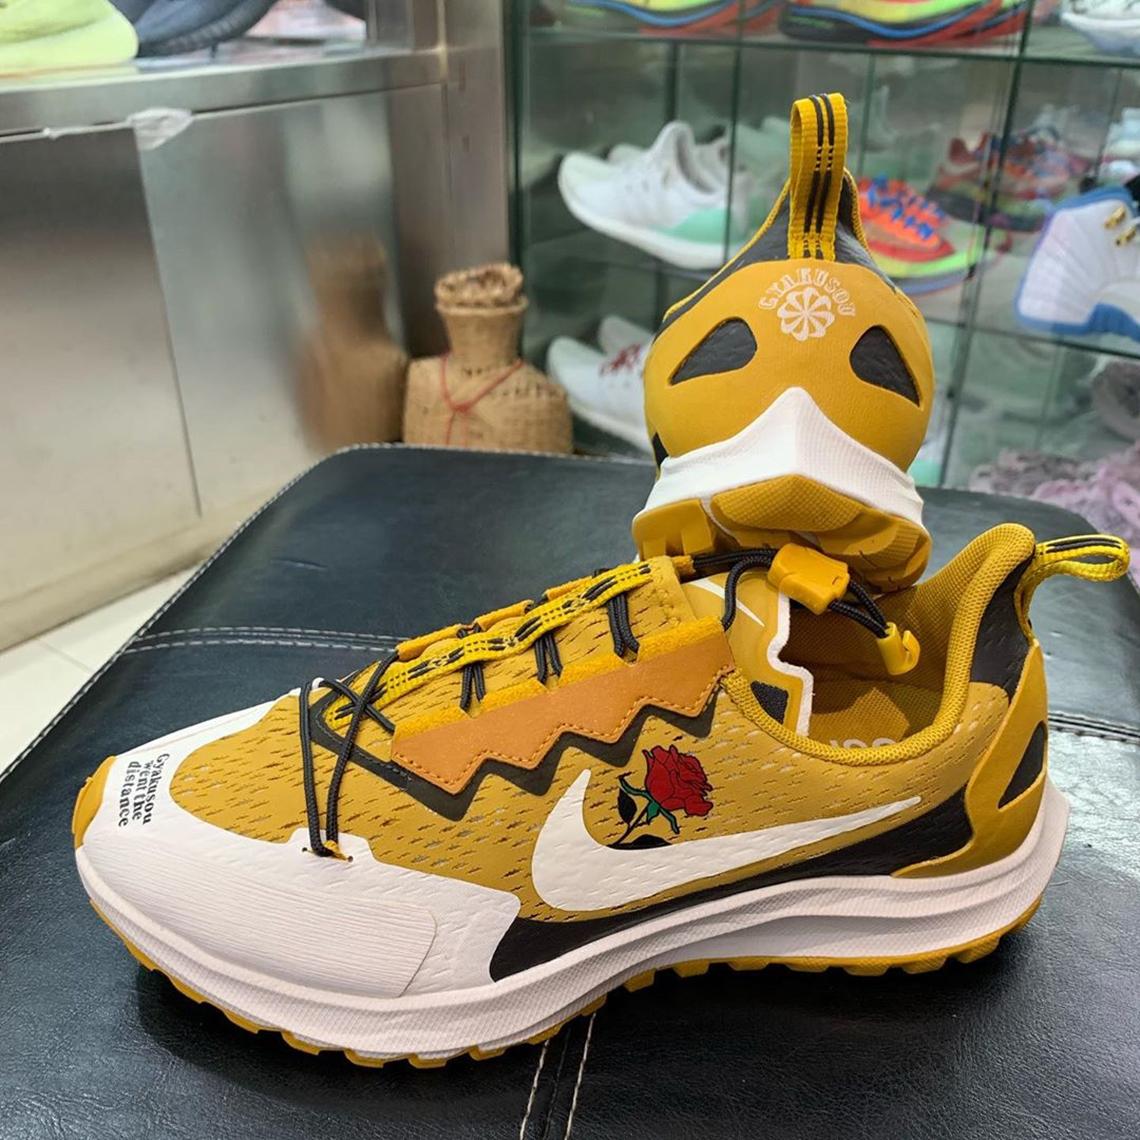 Nike Gyakusou Went The Distance Shoes | SneakerNews.com